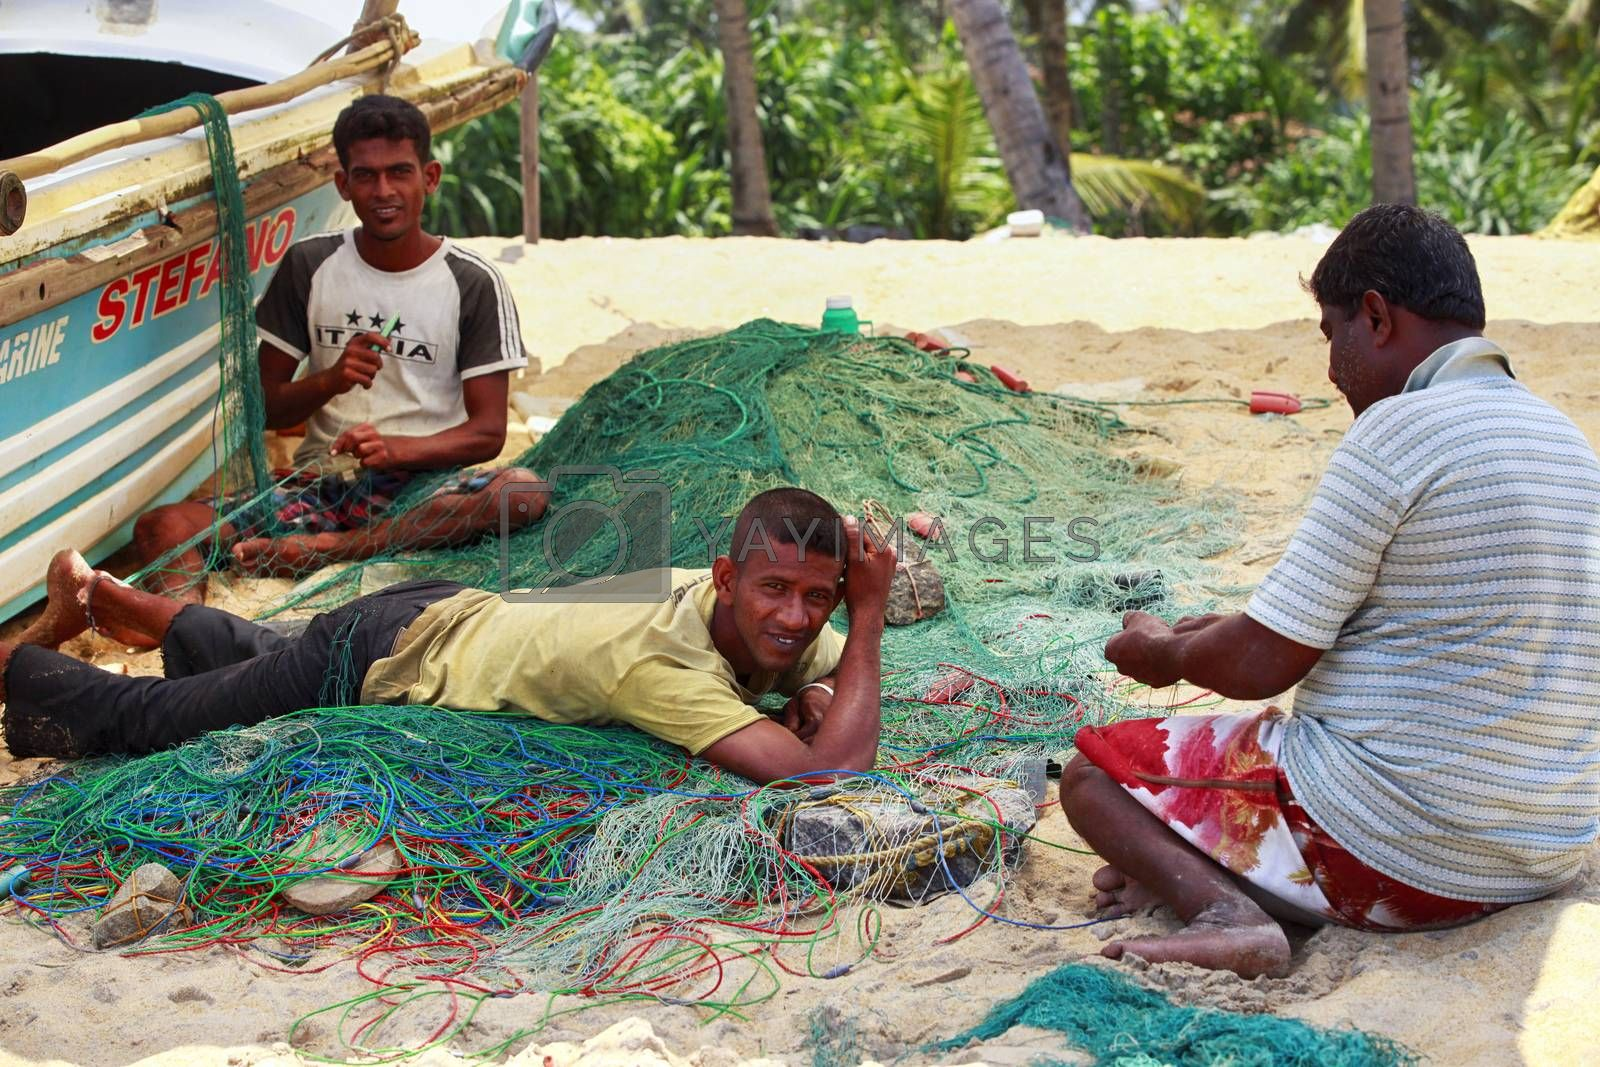 Kalutara, Sri Lanka - April 10, 2011: Three fishermen with fishing nets on the beach of Kalutara in Sri Lanka.